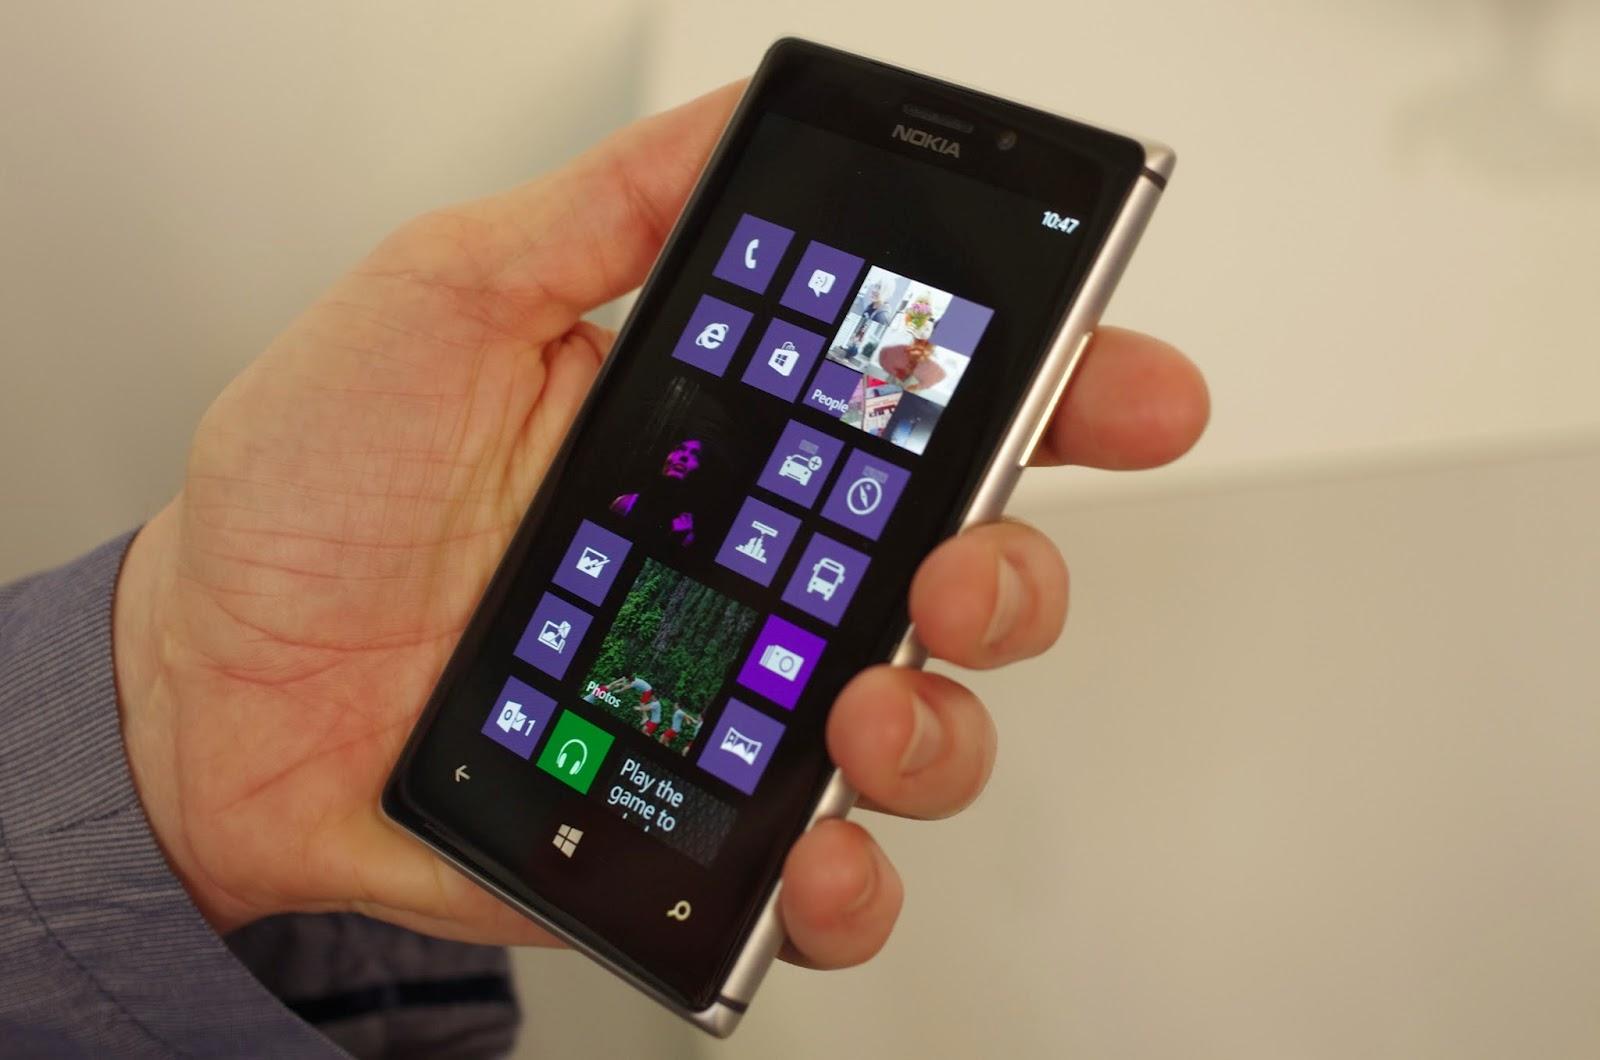 Nokia Lumia 925 Windows Phone 8